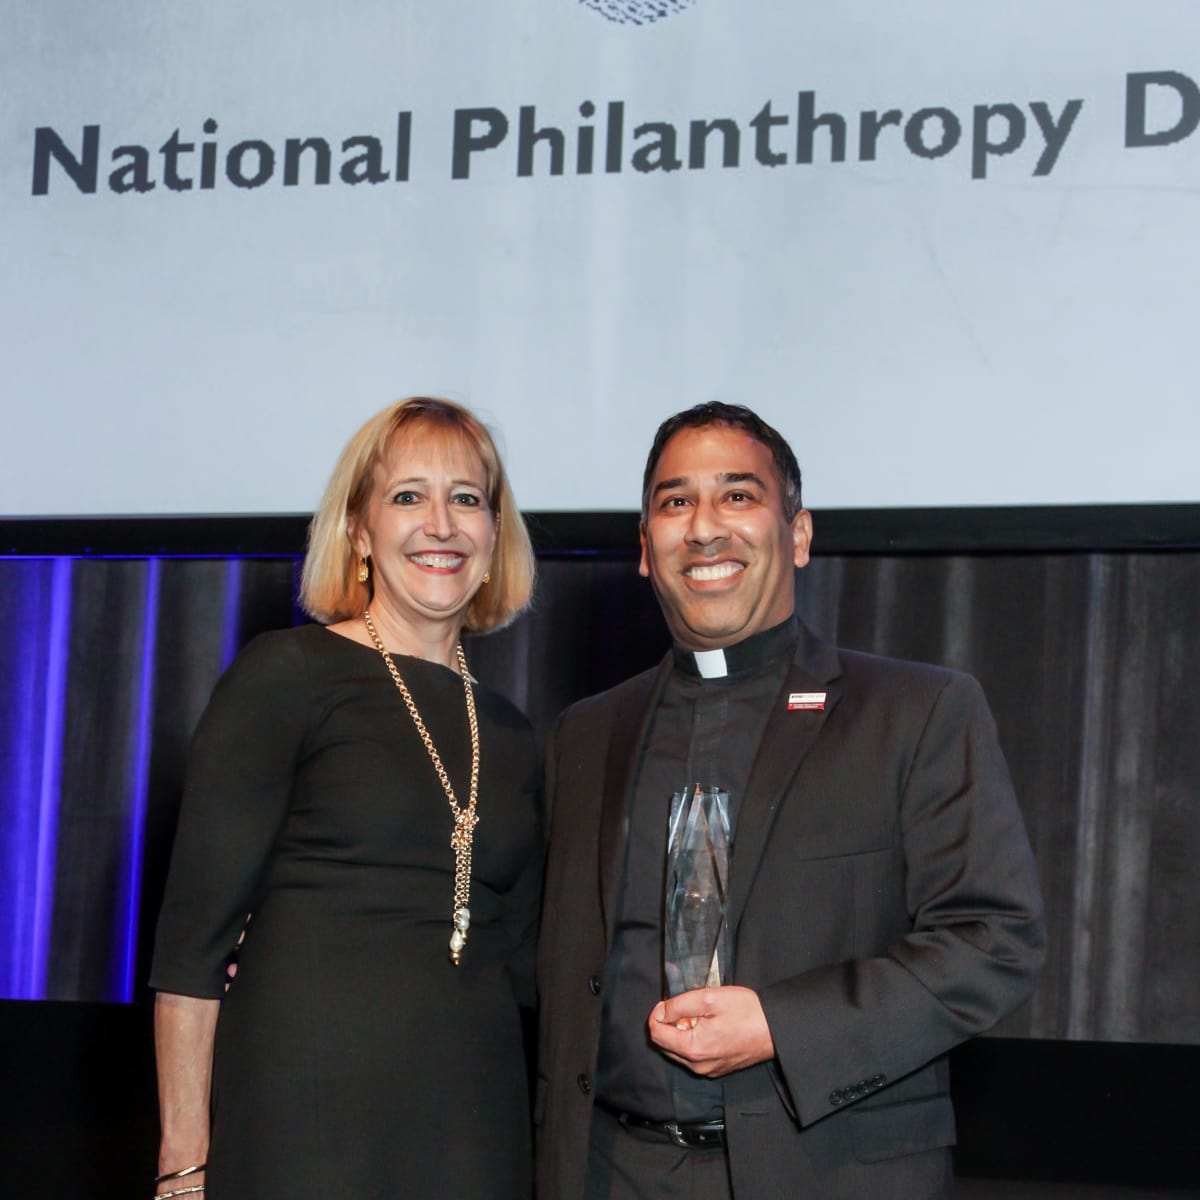 News, National Philanthropy Day Awards, Dec. 2015, Kim Sterling, the Rev. Kevin Storey